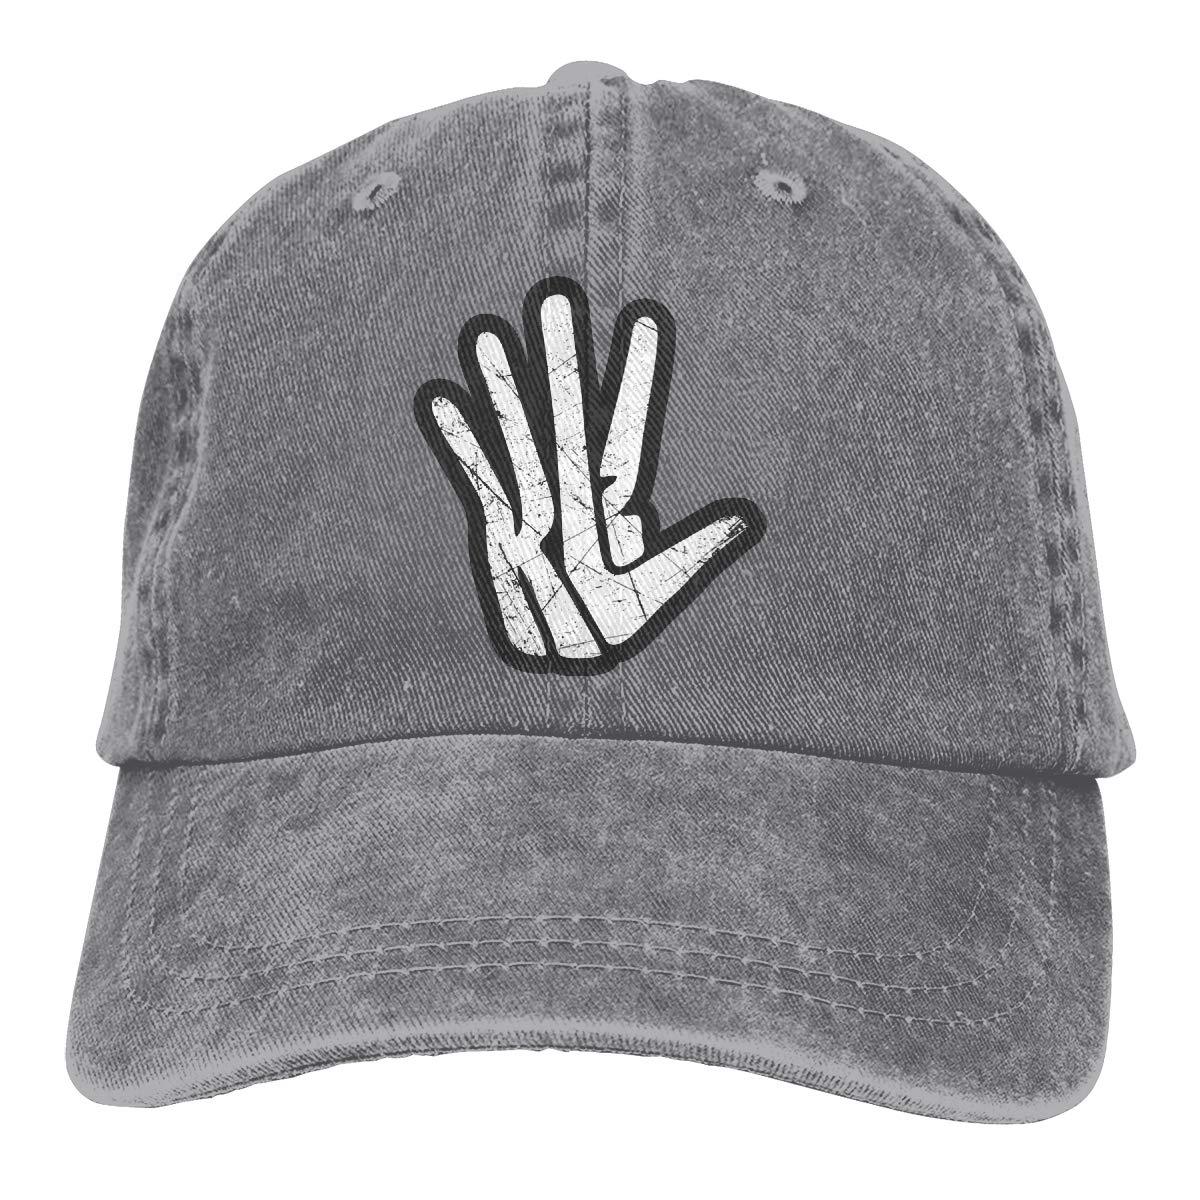 Haggai Romeo Unisex Los Angeles Kawhi Text Pic Snapback Baseball Cap Flat Brim Hip Hop Hat Adjustable Dad Hat